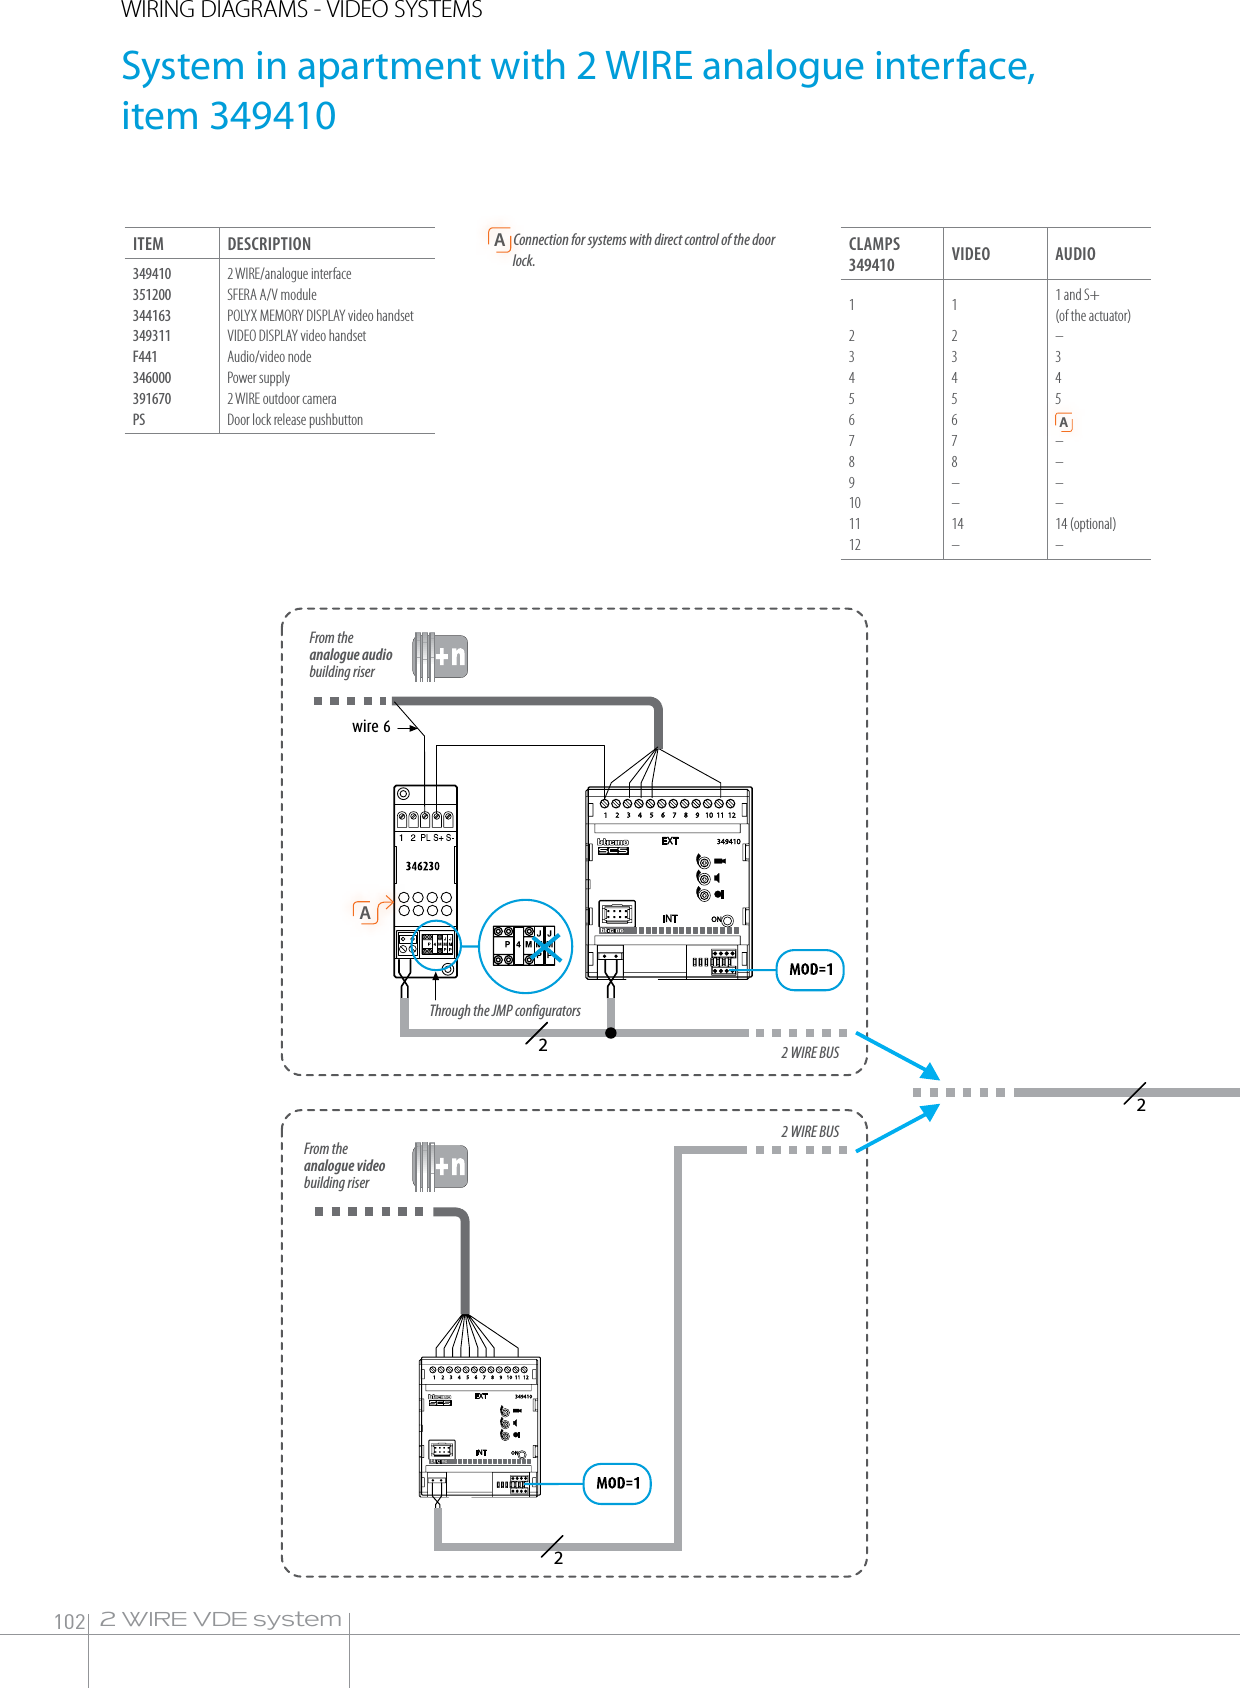 Wiring_diagrams Wiring Diagrams on